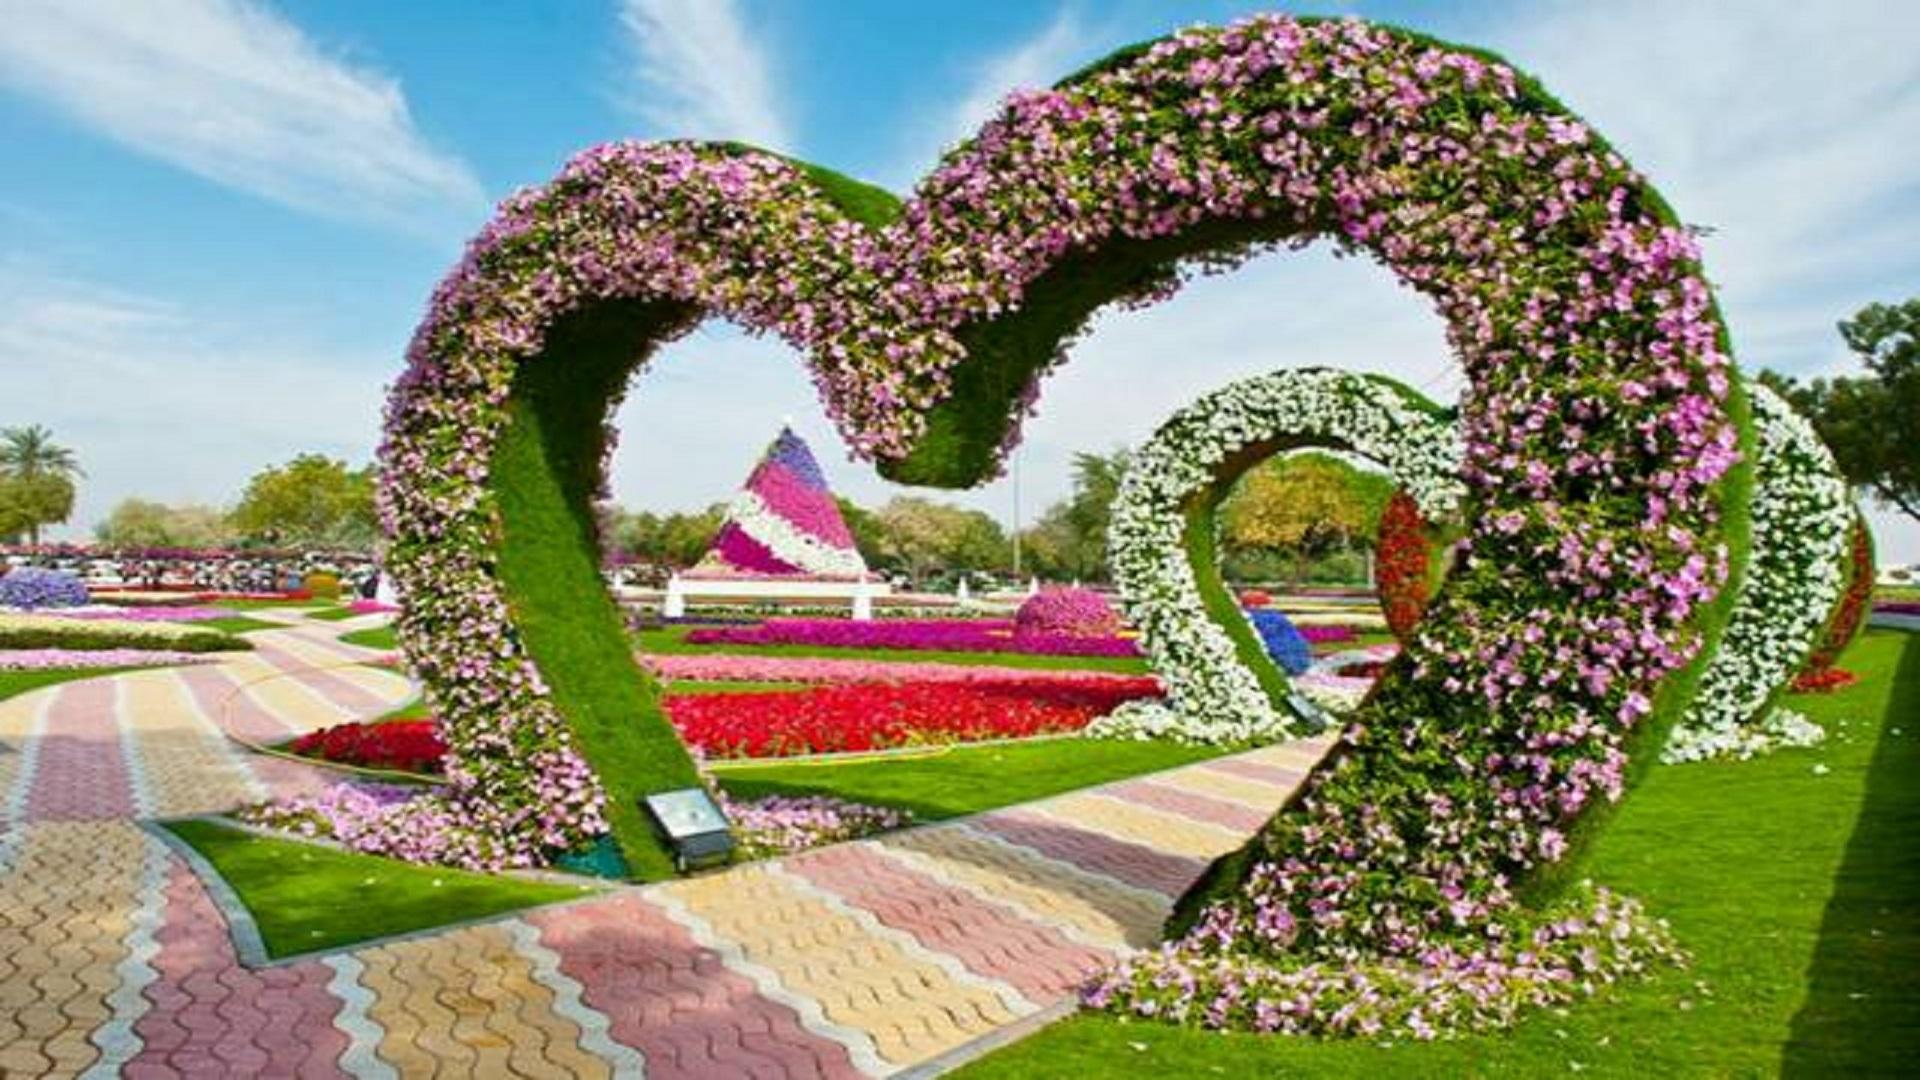 Flower Images 3d Wallpapers Garden Wallpapers Hd Pixelstalk Net